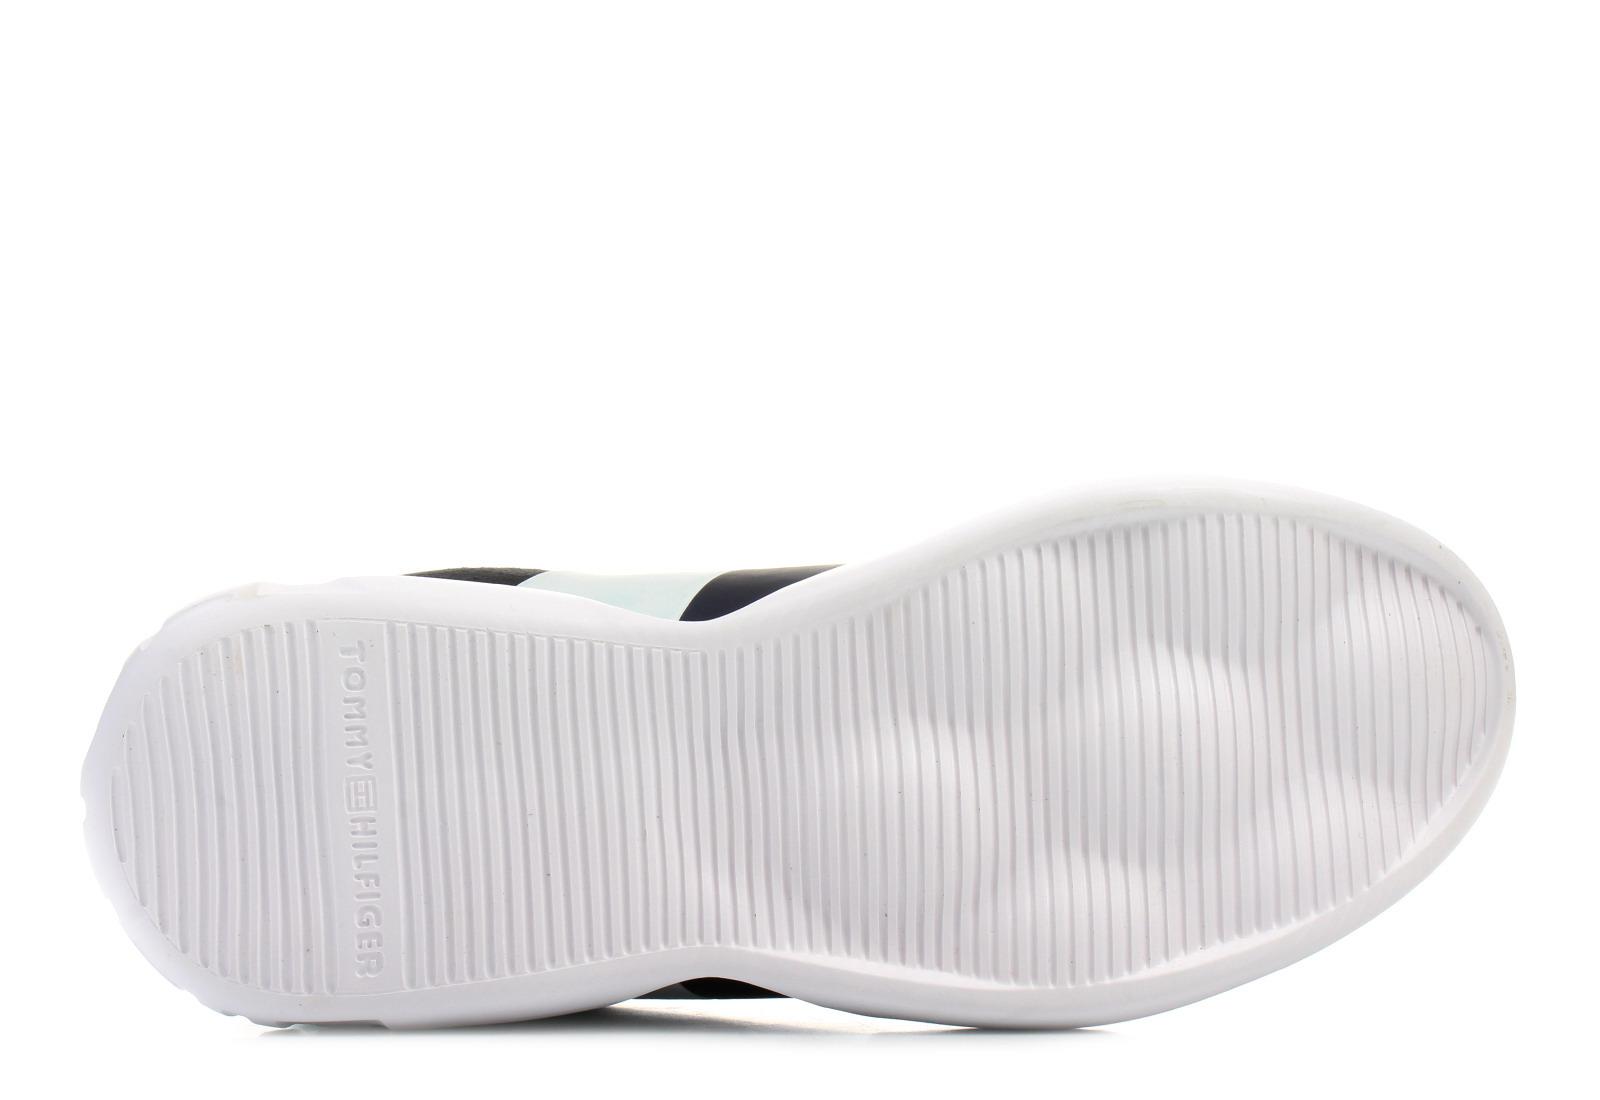 Tommy Hilfiger Cipő - Tate 1c - 18F-1824-403 - Office Shoes Magyarország da2a65d259